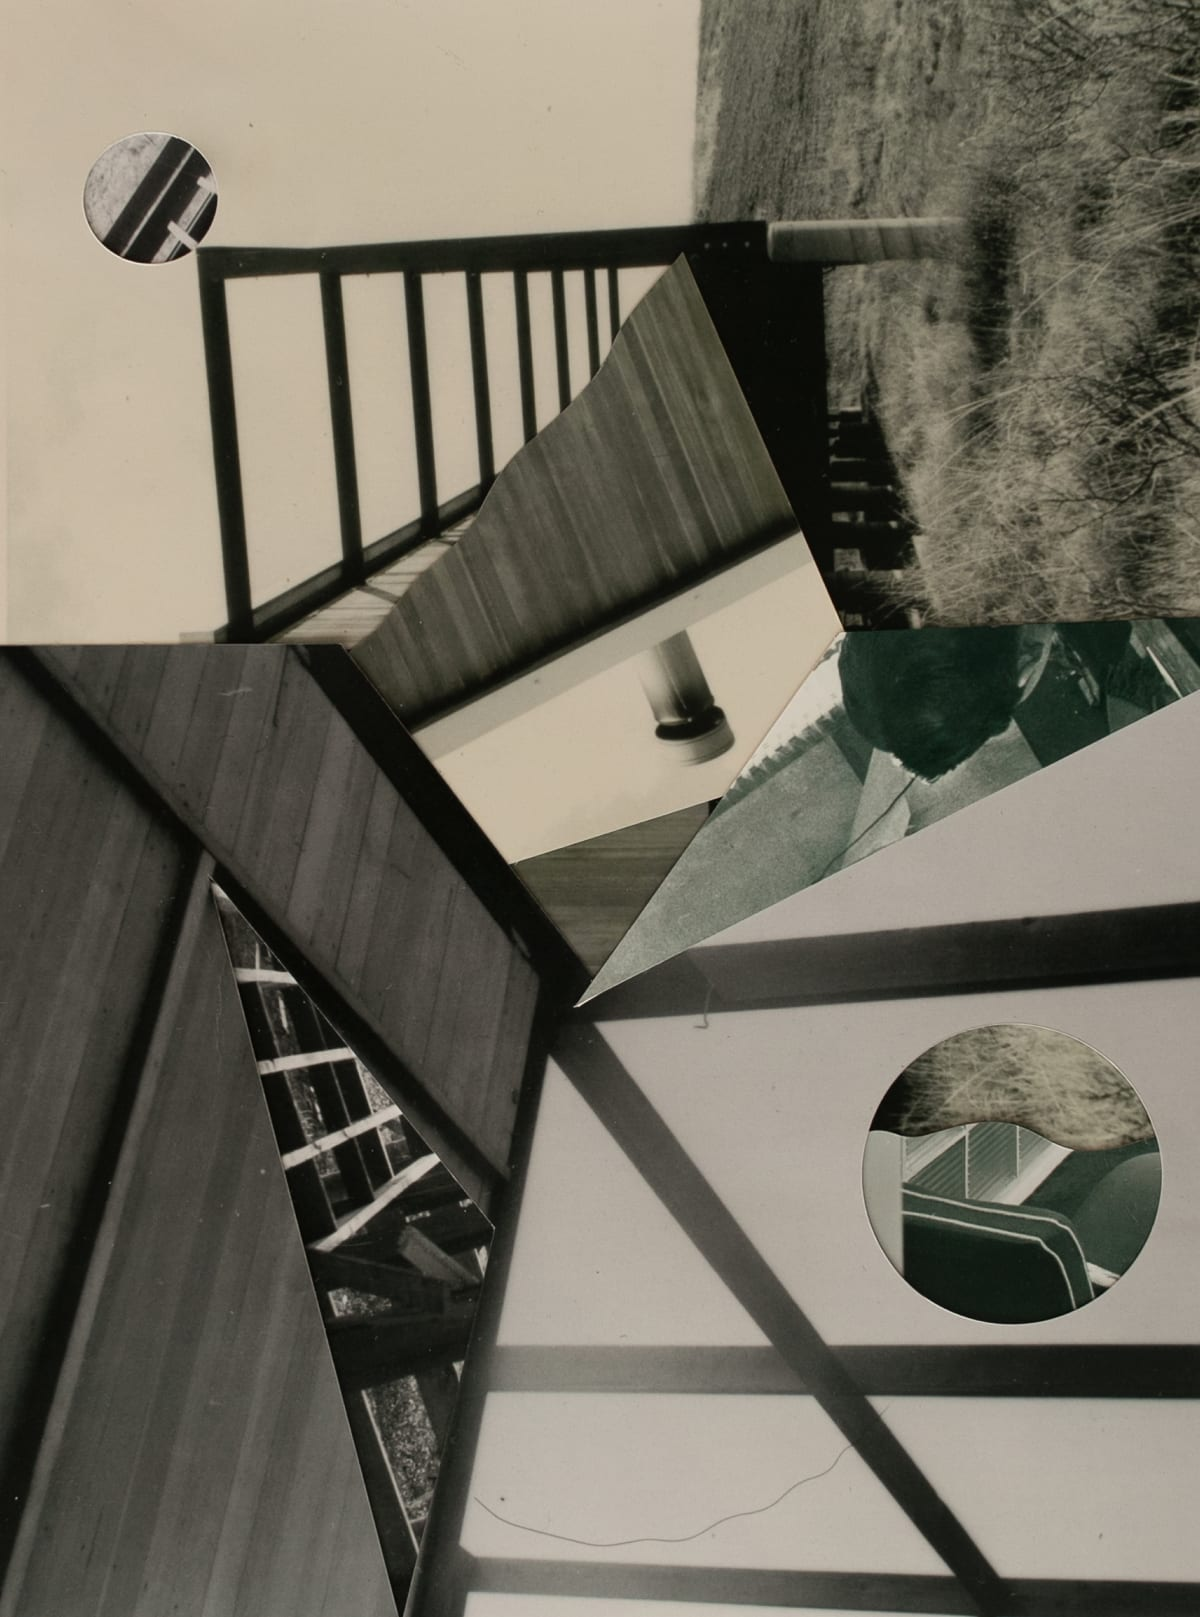 Bara Jichova Tyson, The Hatch House 4, 2014